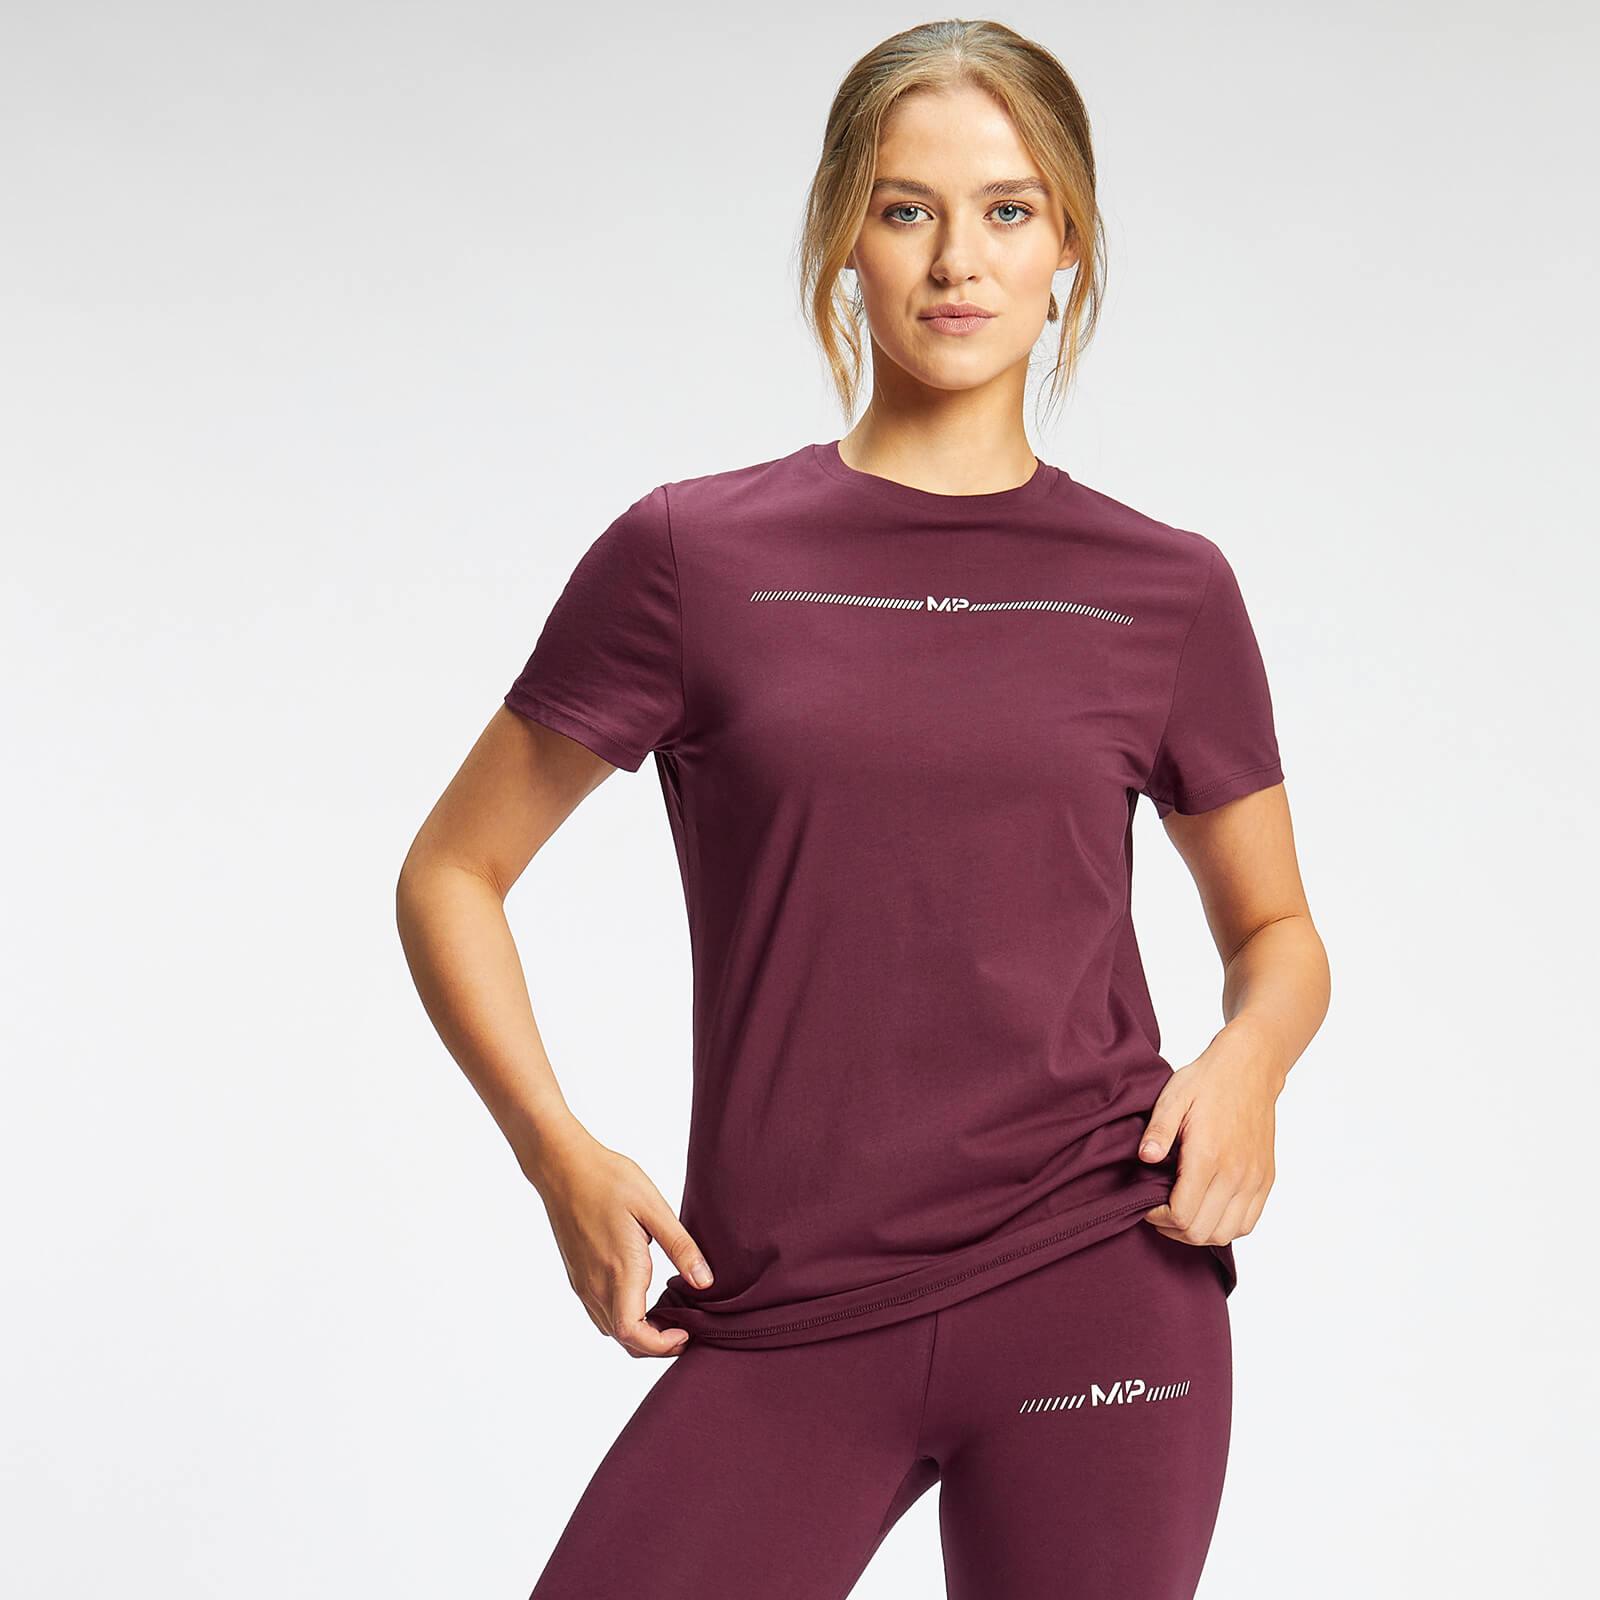 Купить MP Women's Mini Mark Graphic T-Shirt - Merlot - S, Myprotein International